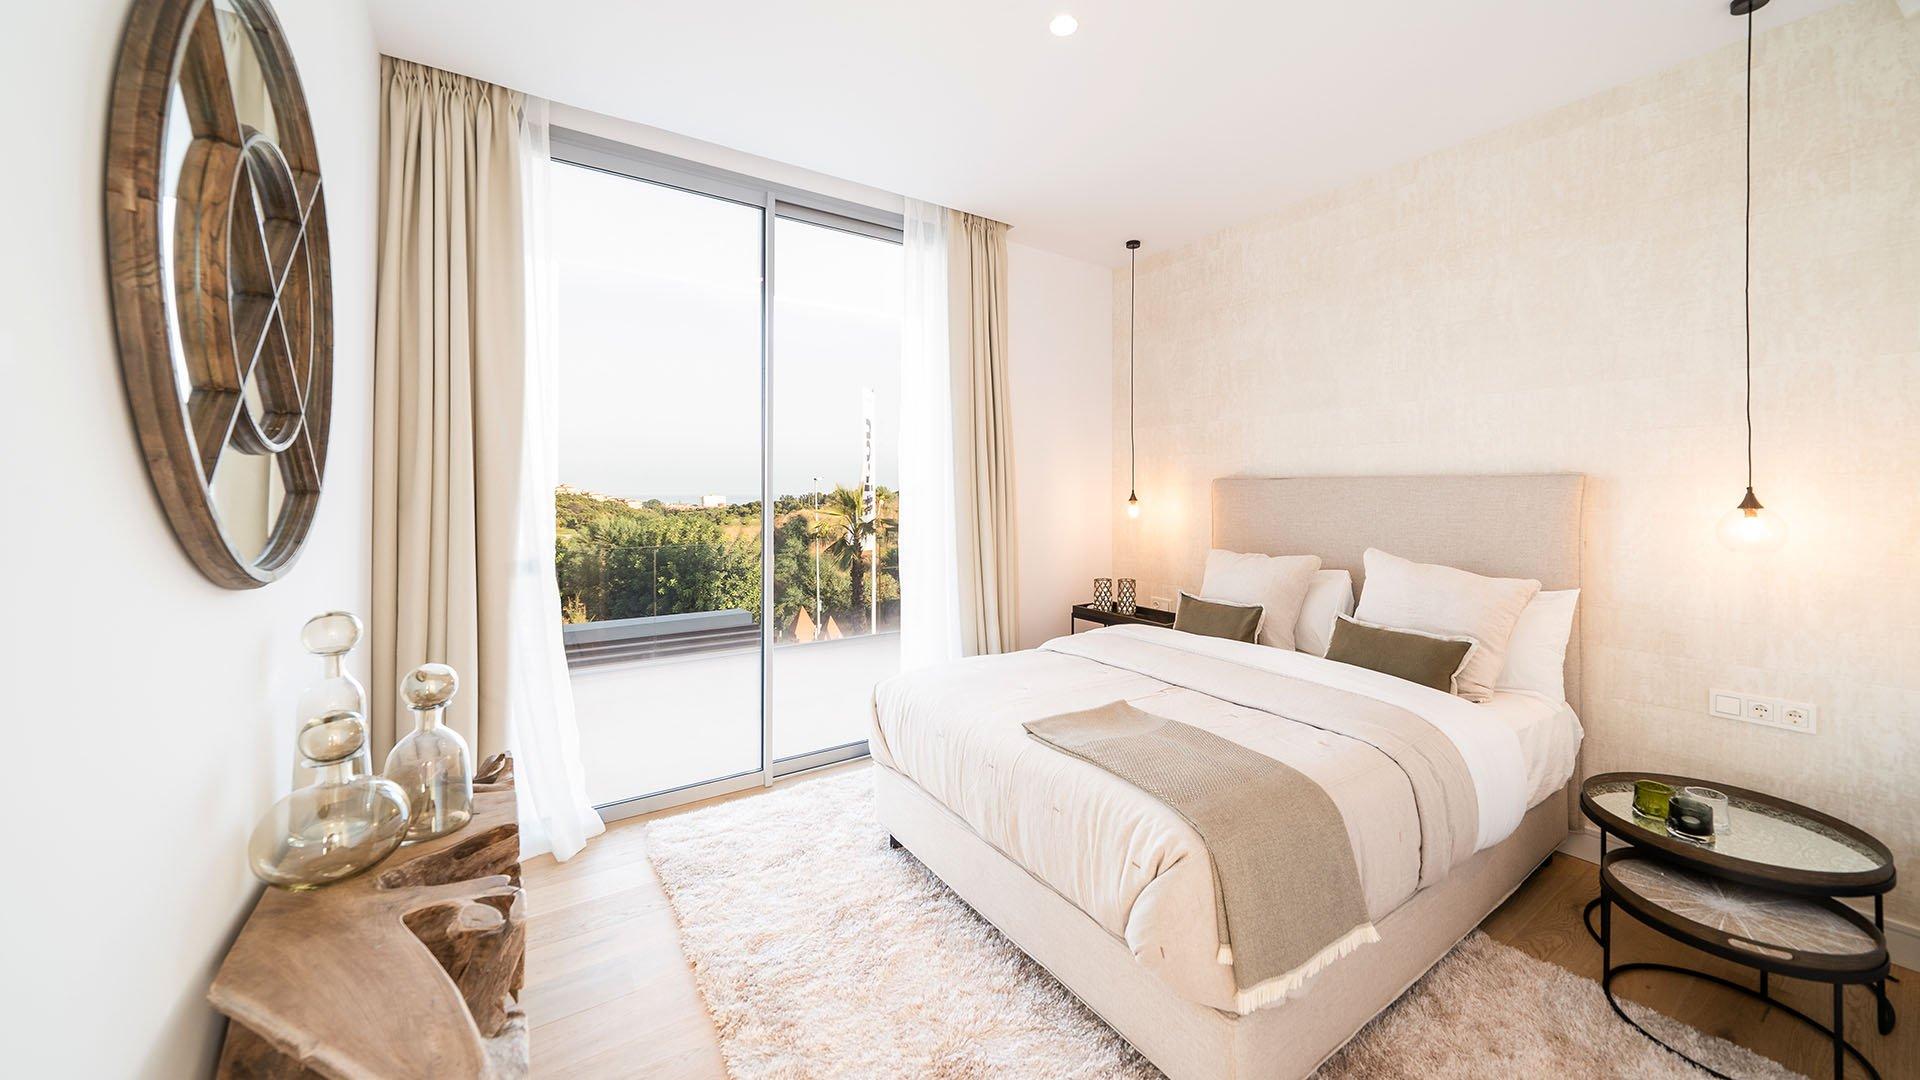 Icon Marbella – The Residences: Modern luxury villas in Marbella